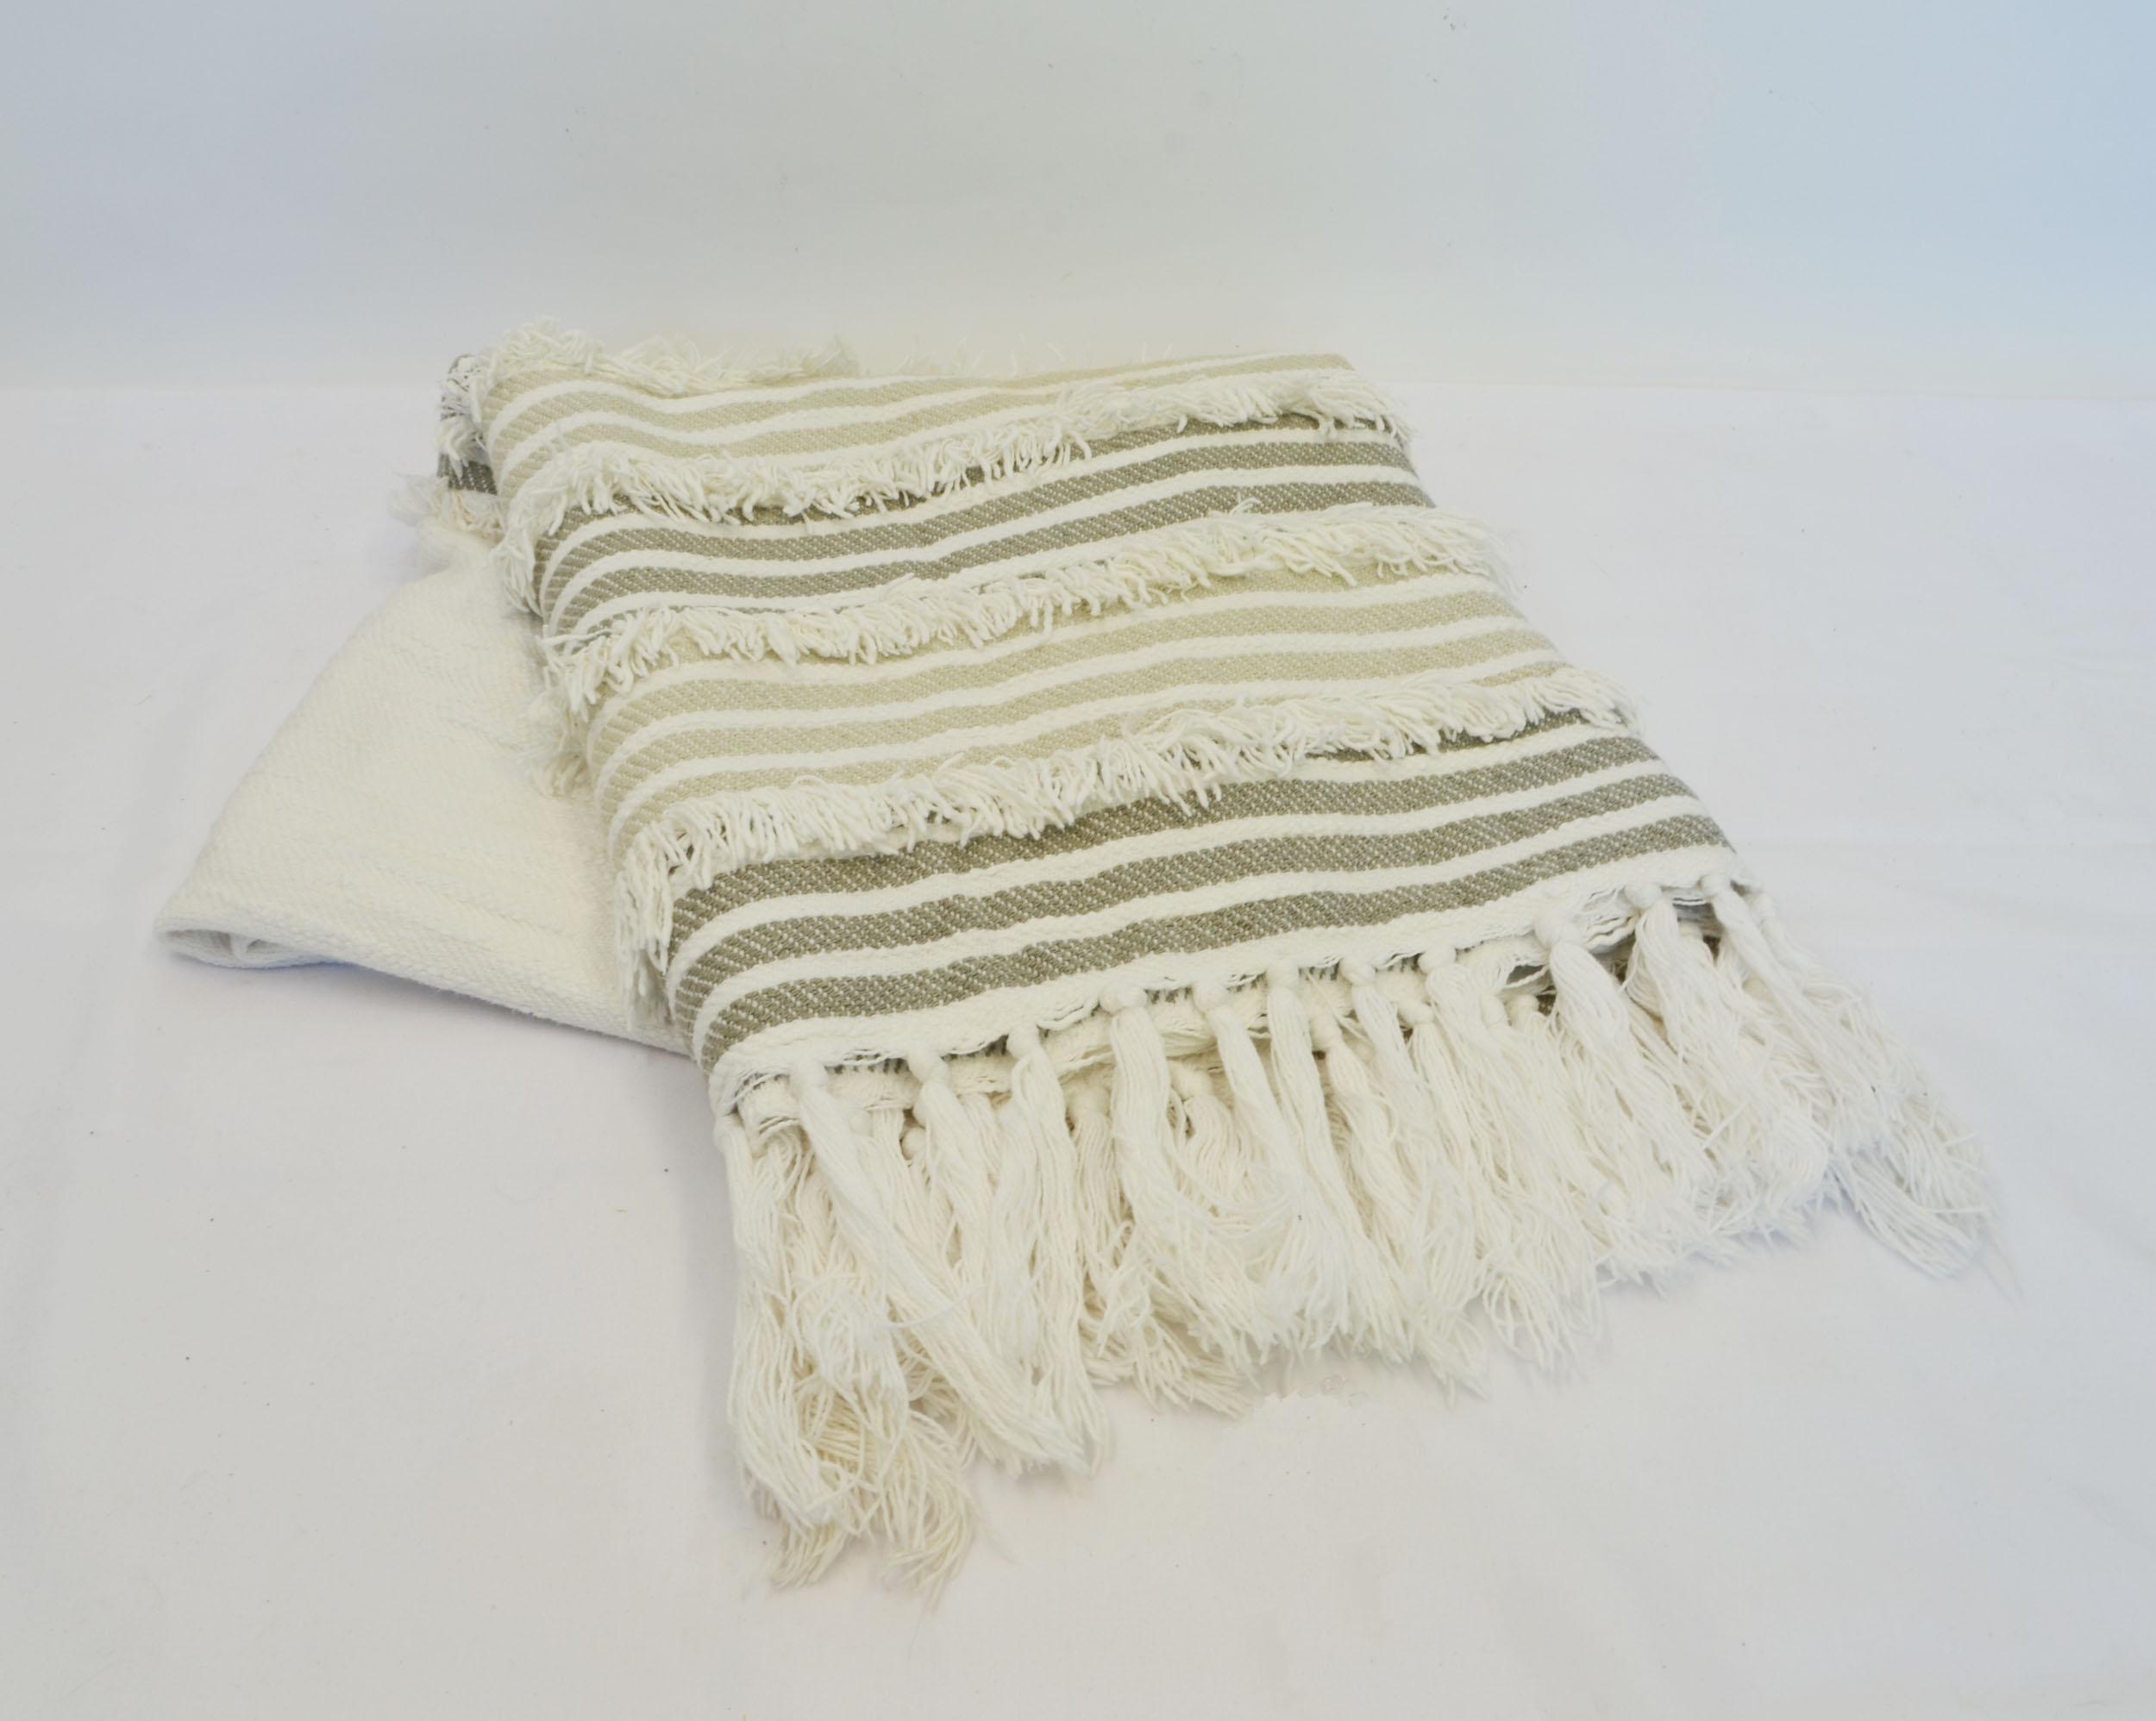 striped cream throw blanket   Quantity: 2  Price: $5.50